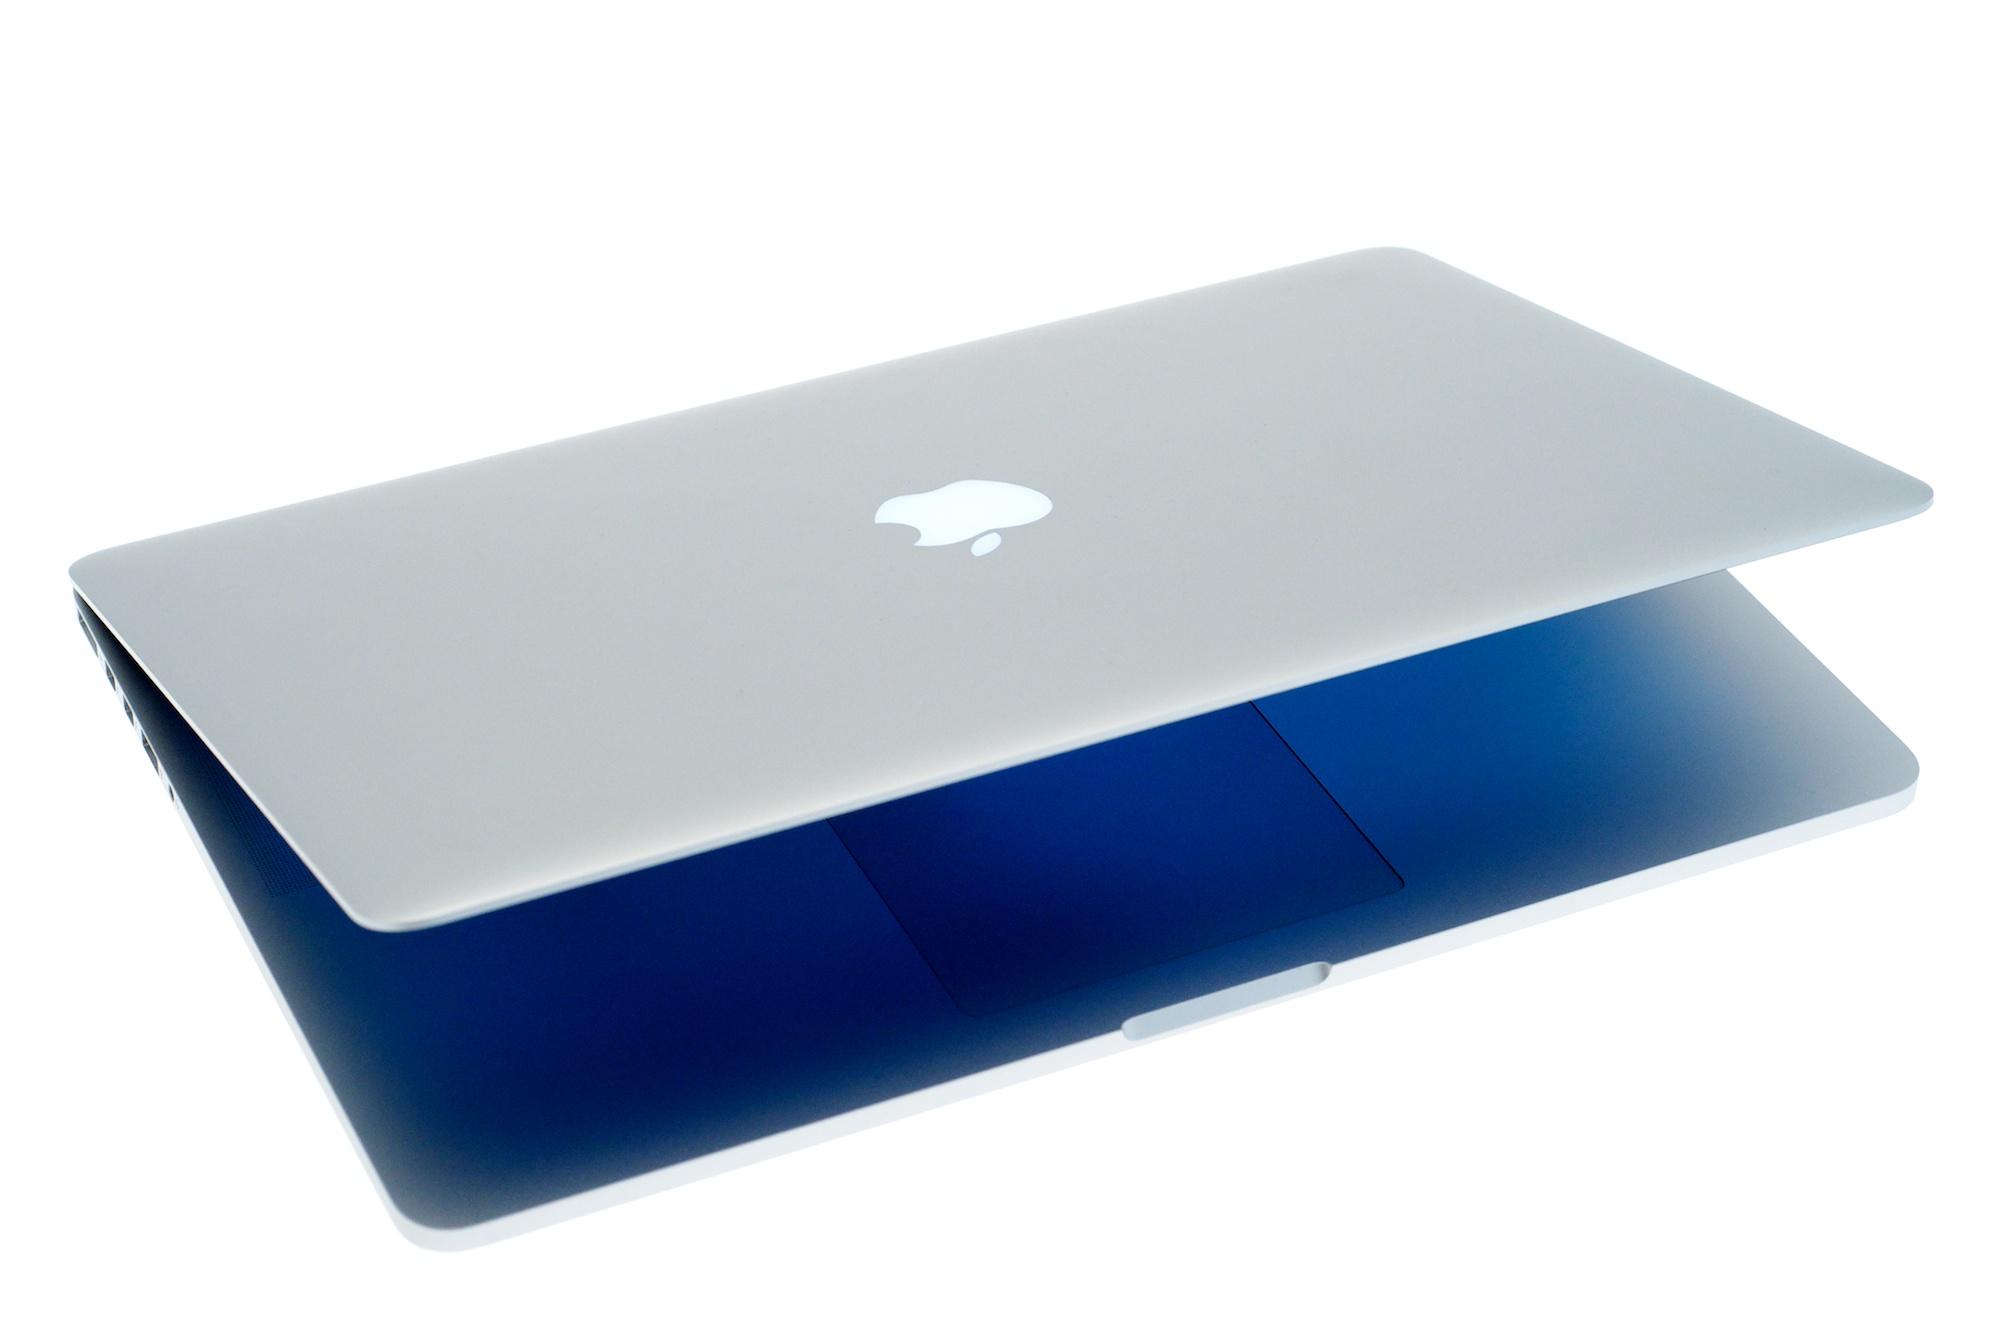 macbook pro 15 inch manual